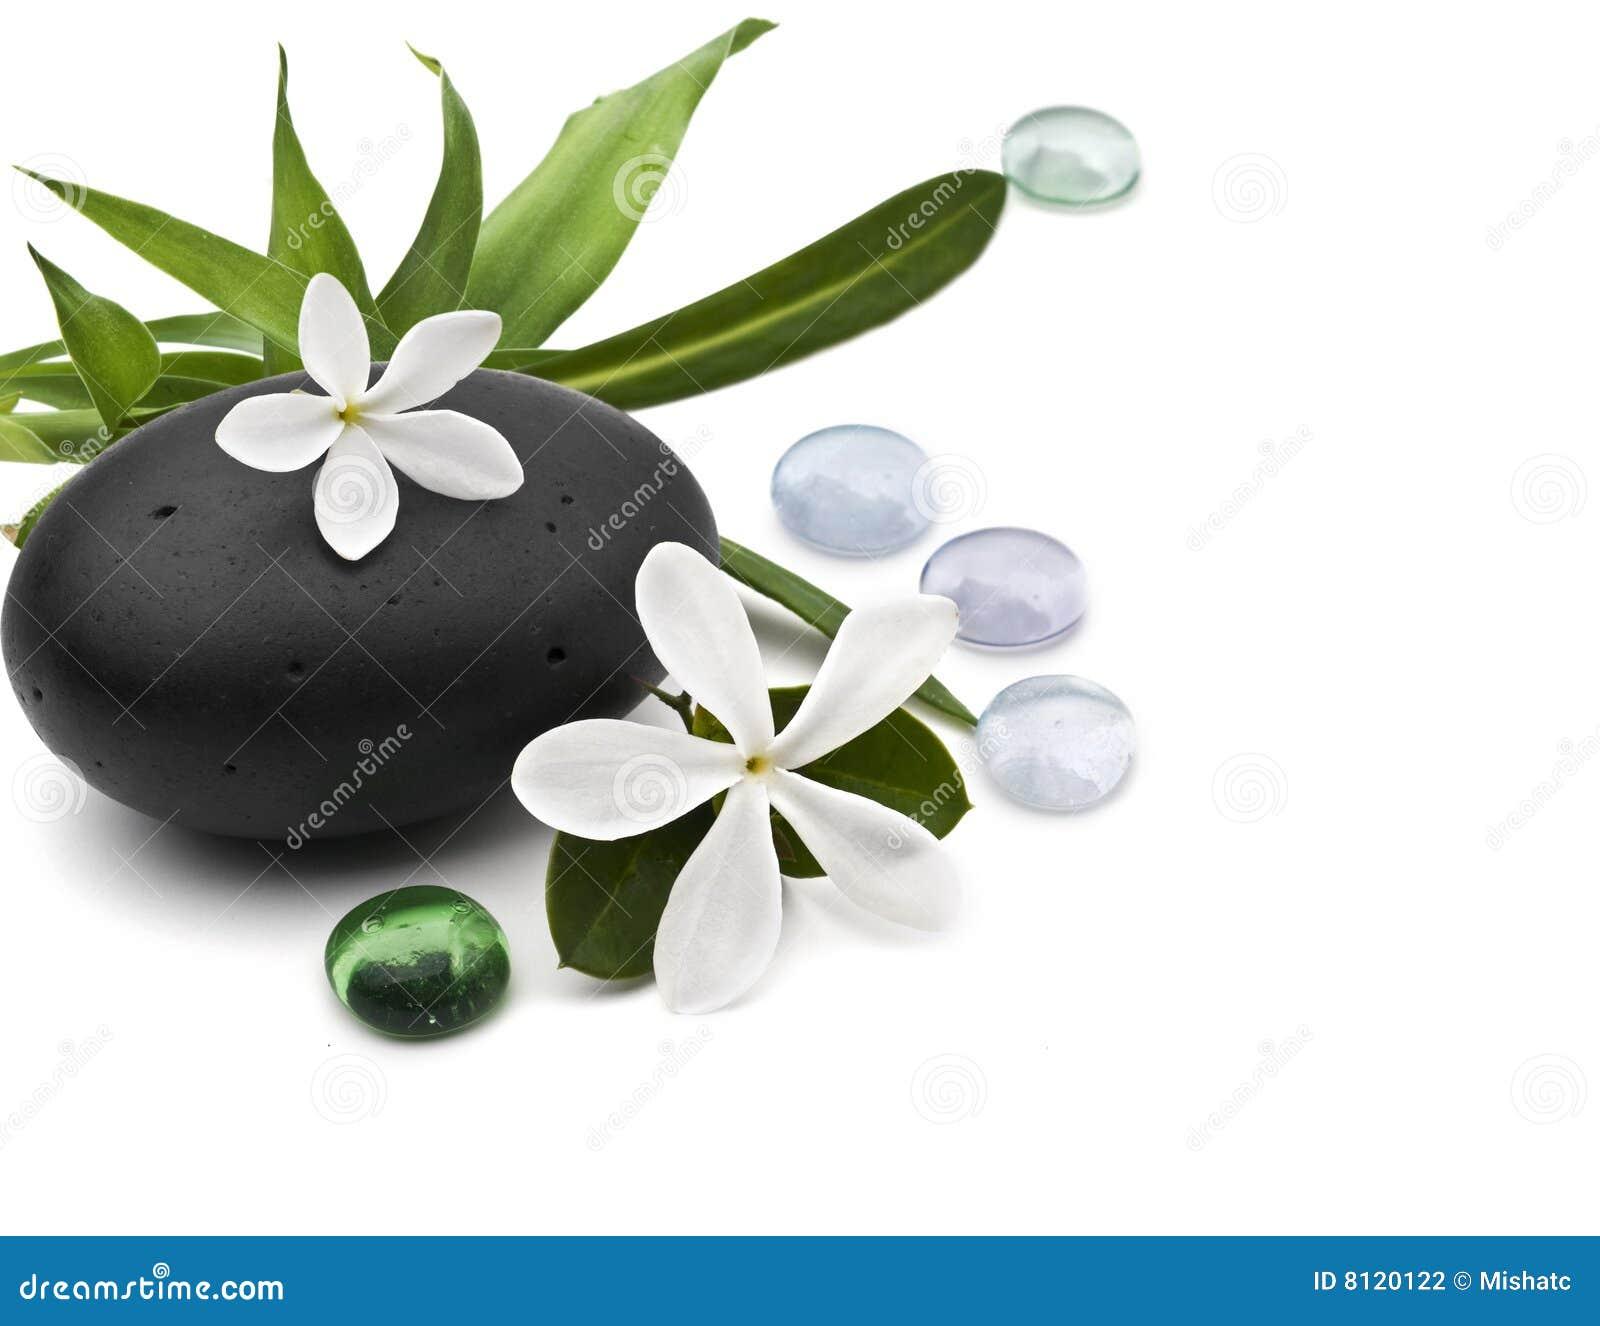 Spa still life with frangipani